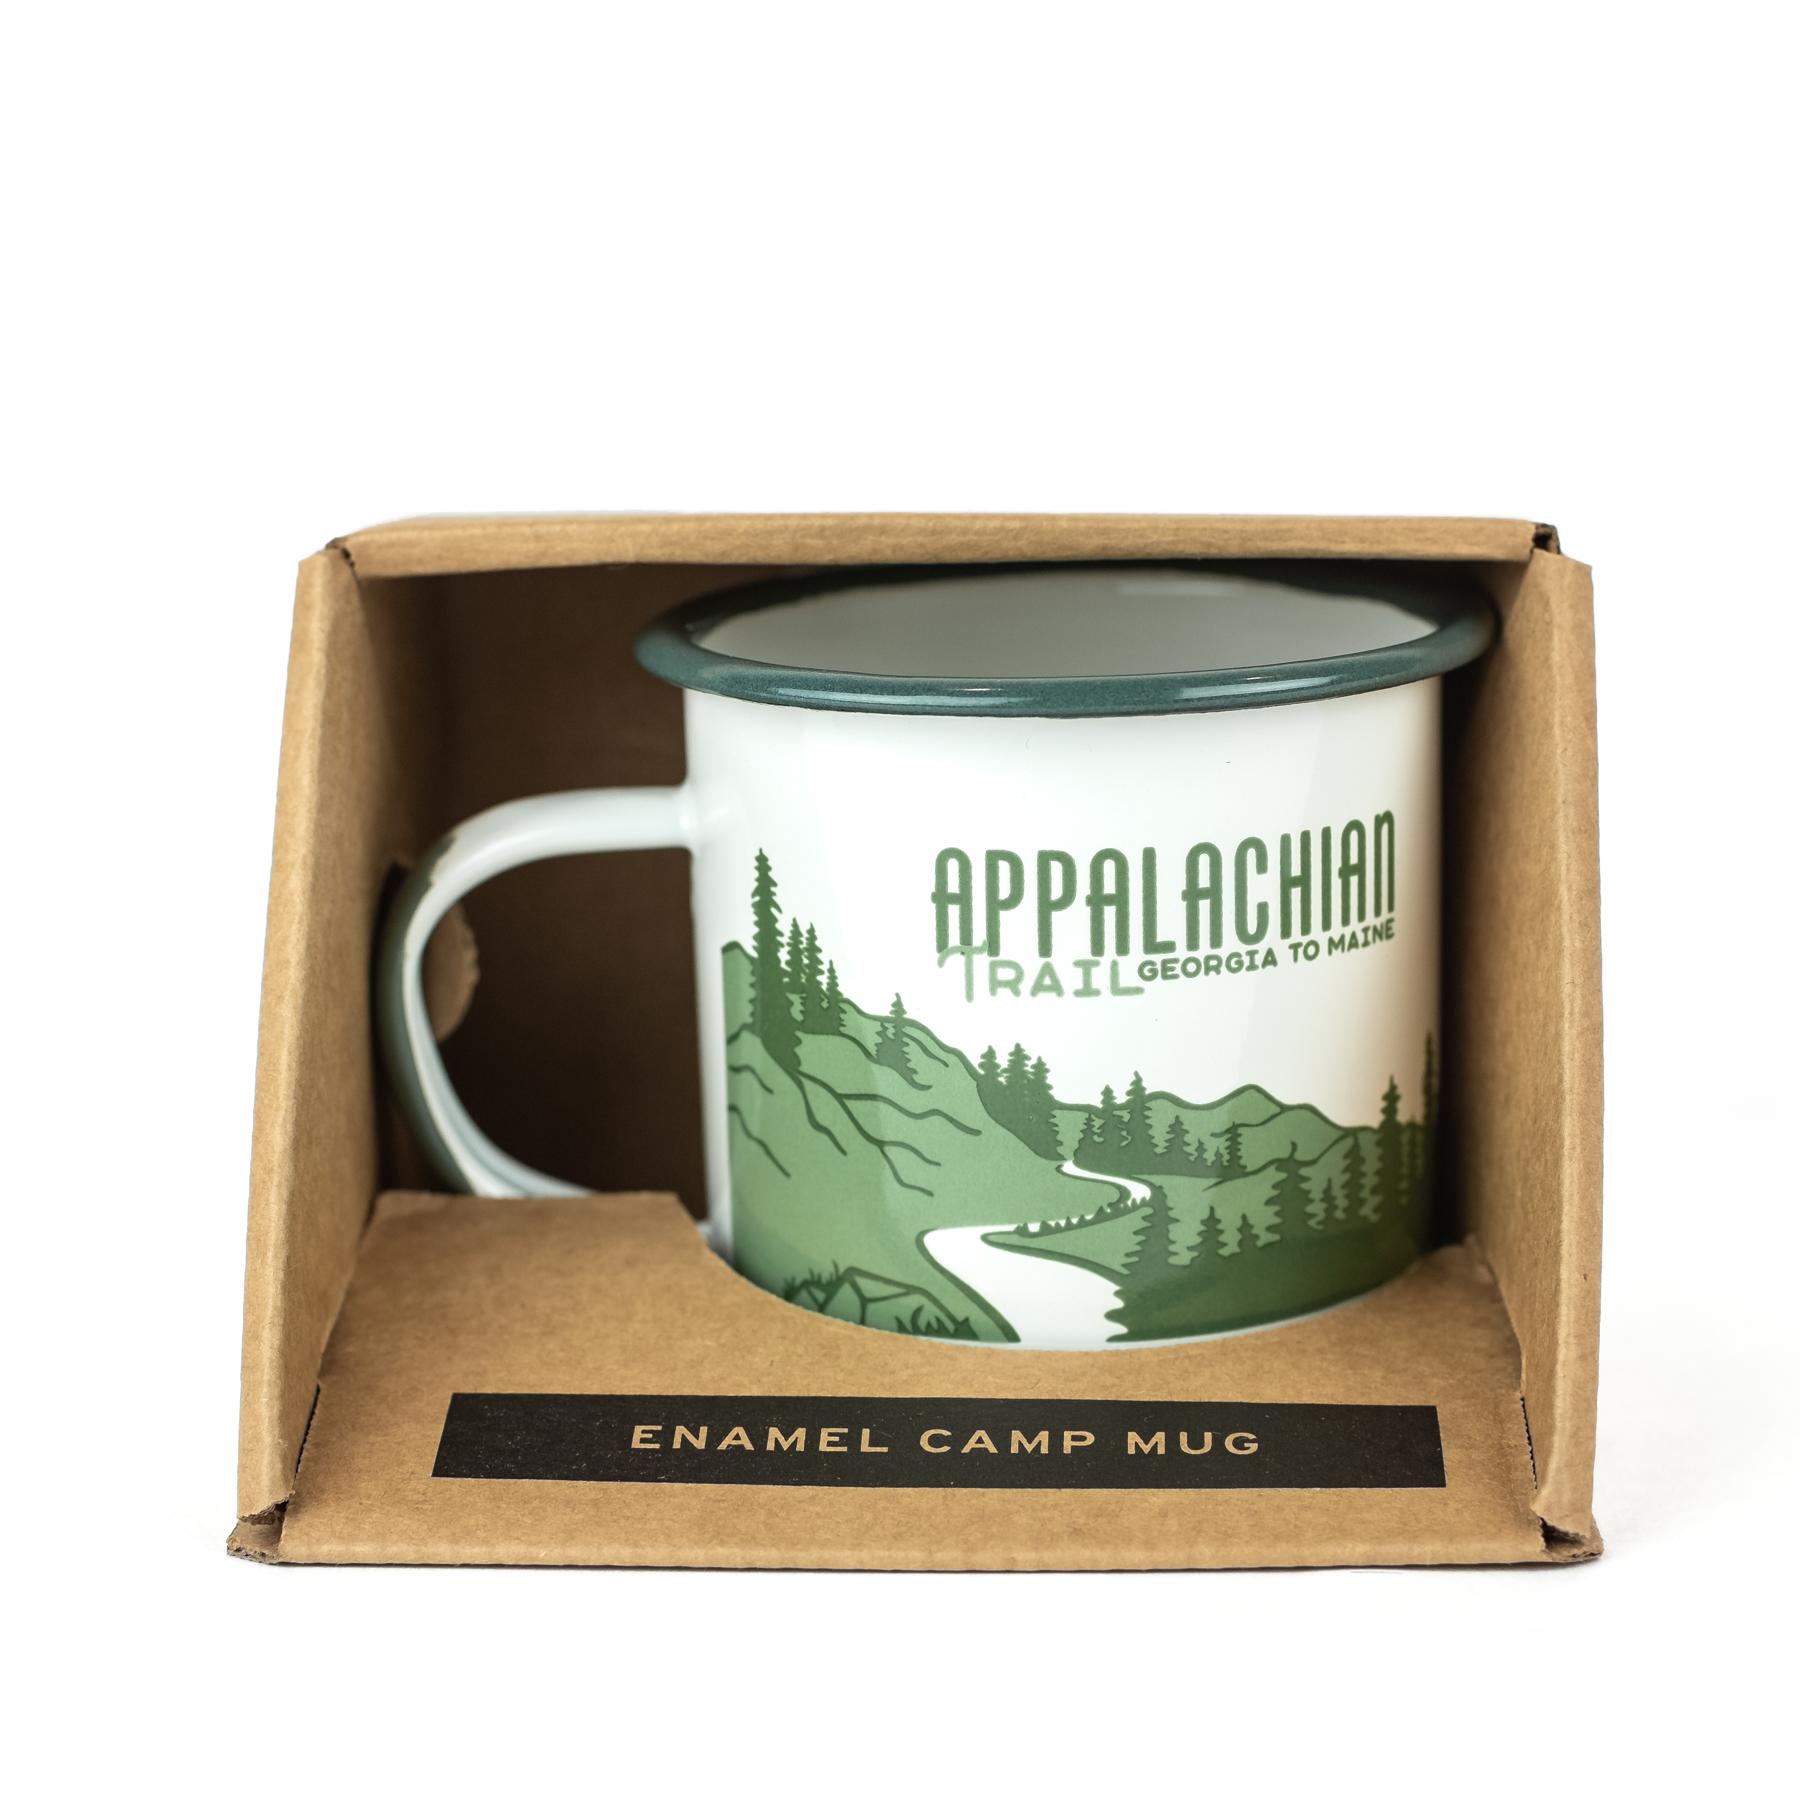 appalachian-trail-mug-1.jpg